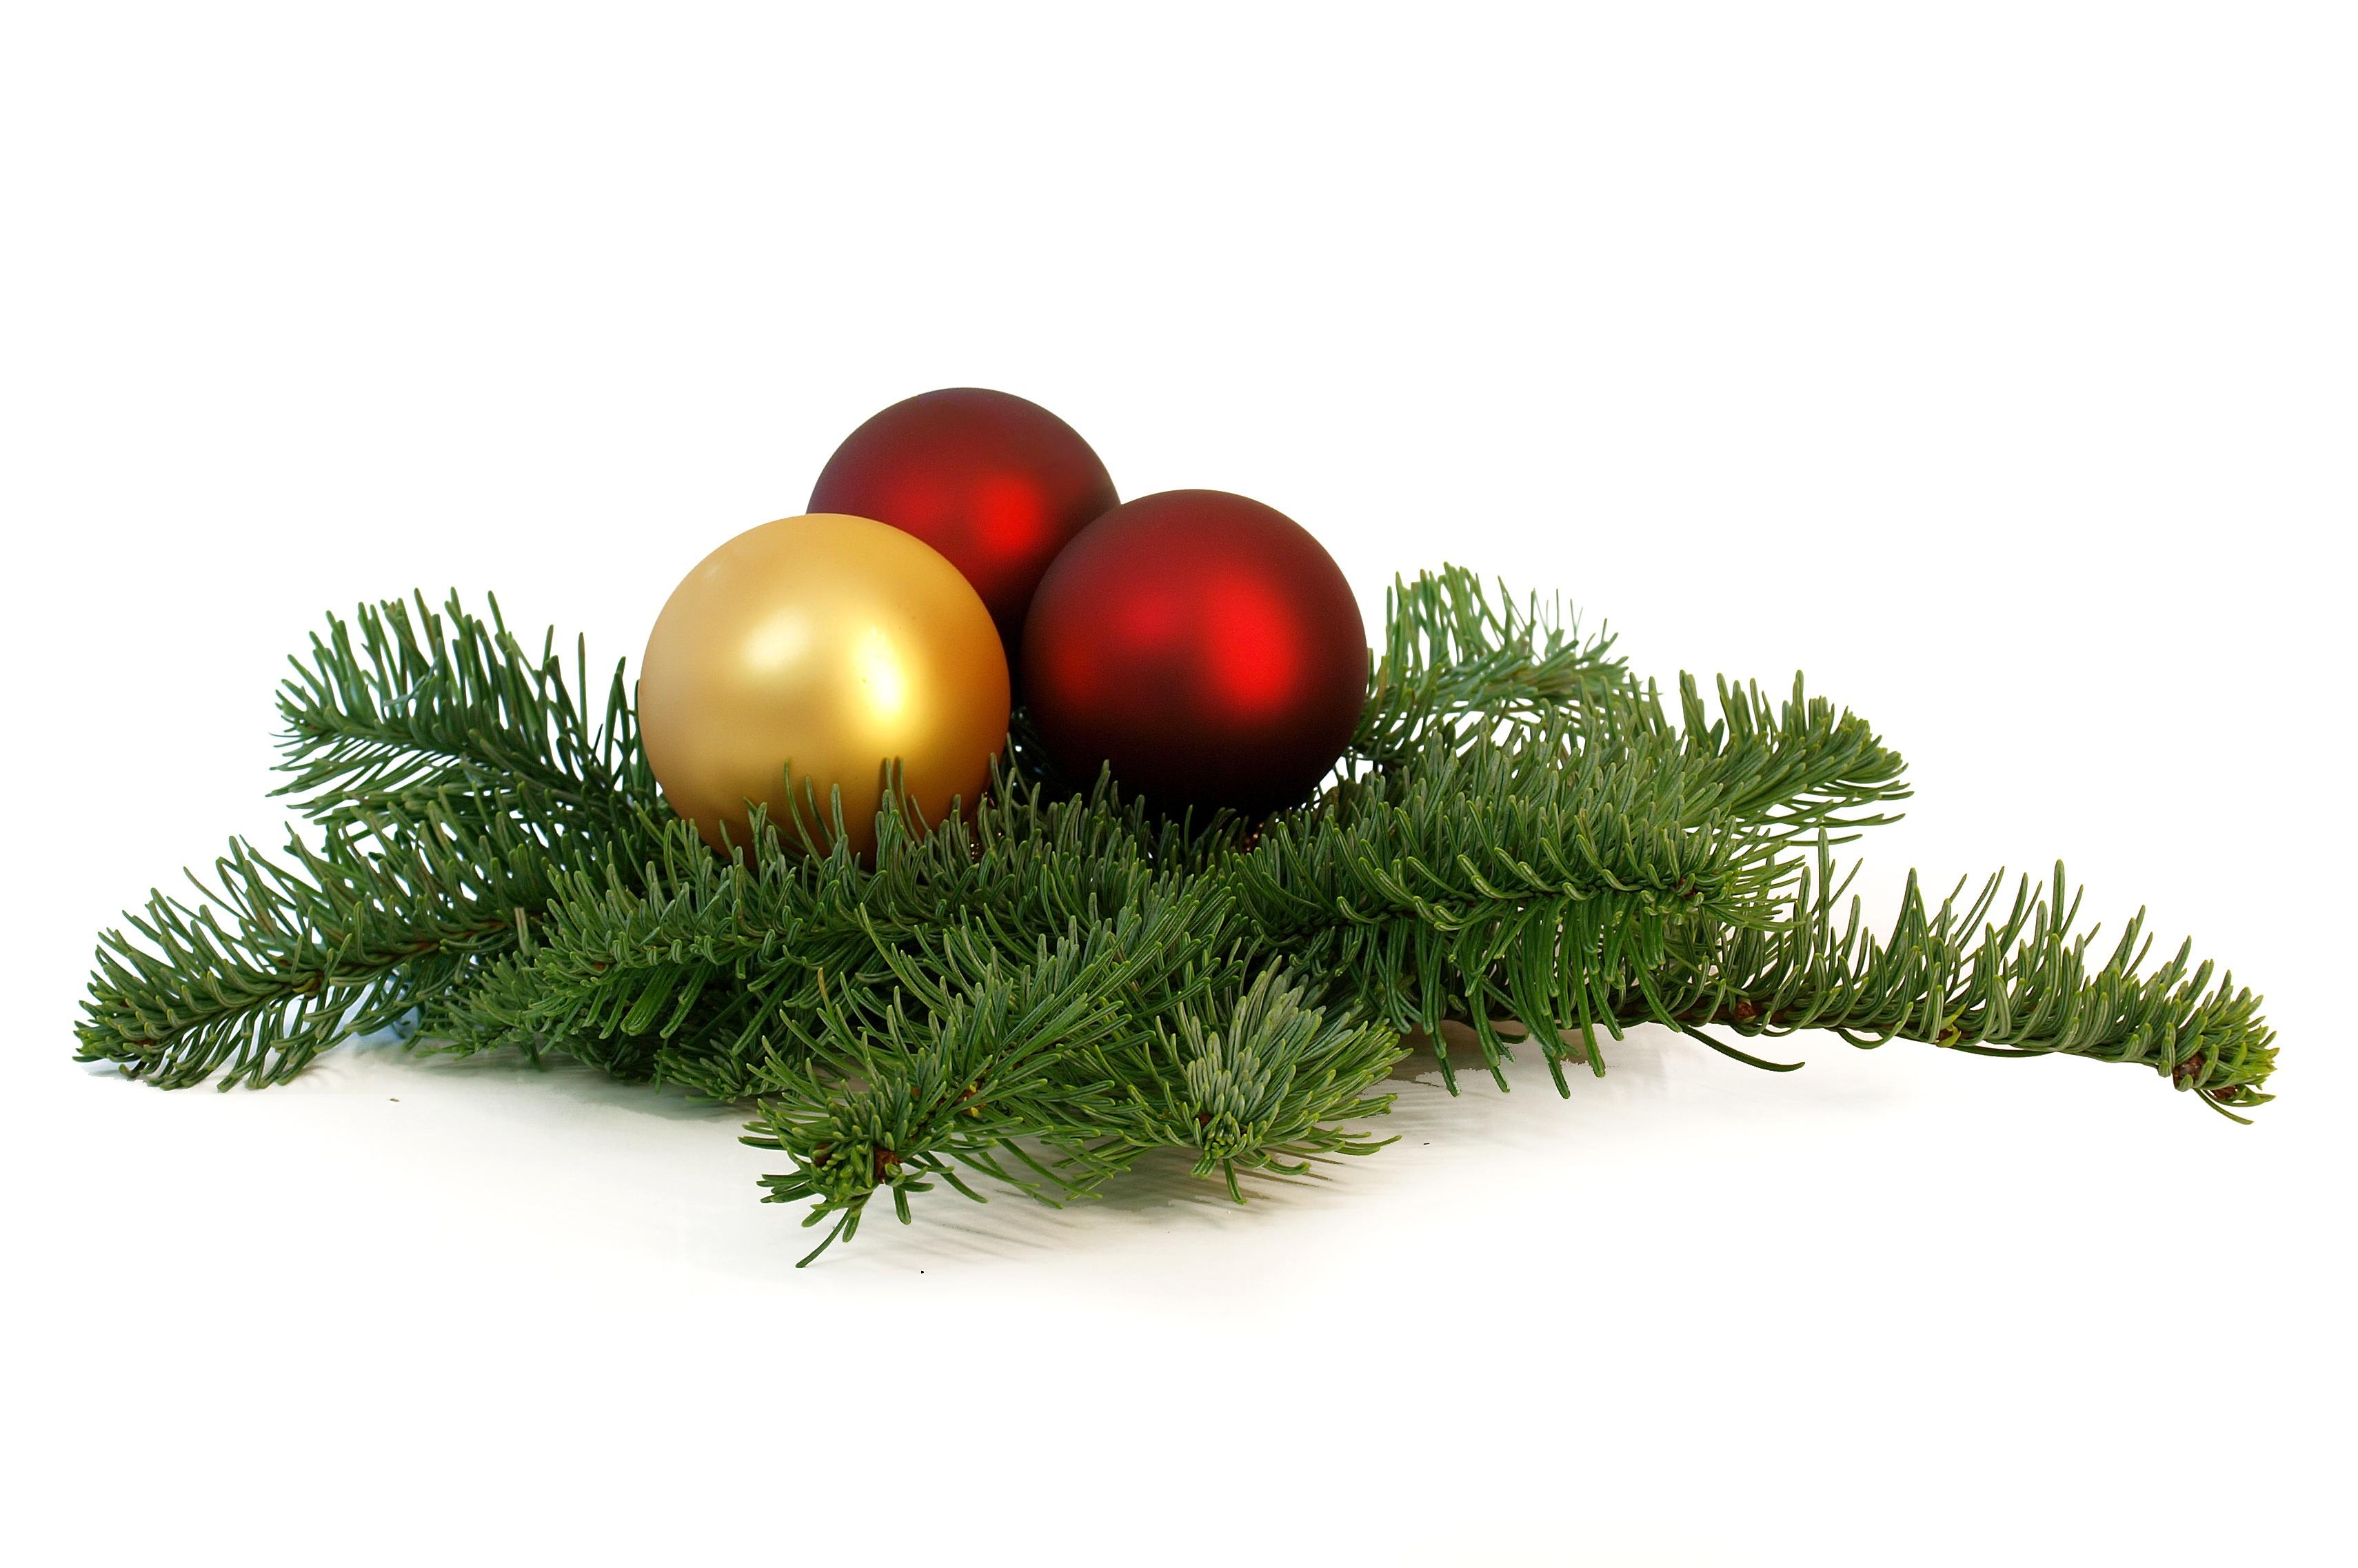 tree grass branch red christmas fir christmas tree twig christmas ornament christmas decoration spruce gold balls - Christmas Decoration Images Free